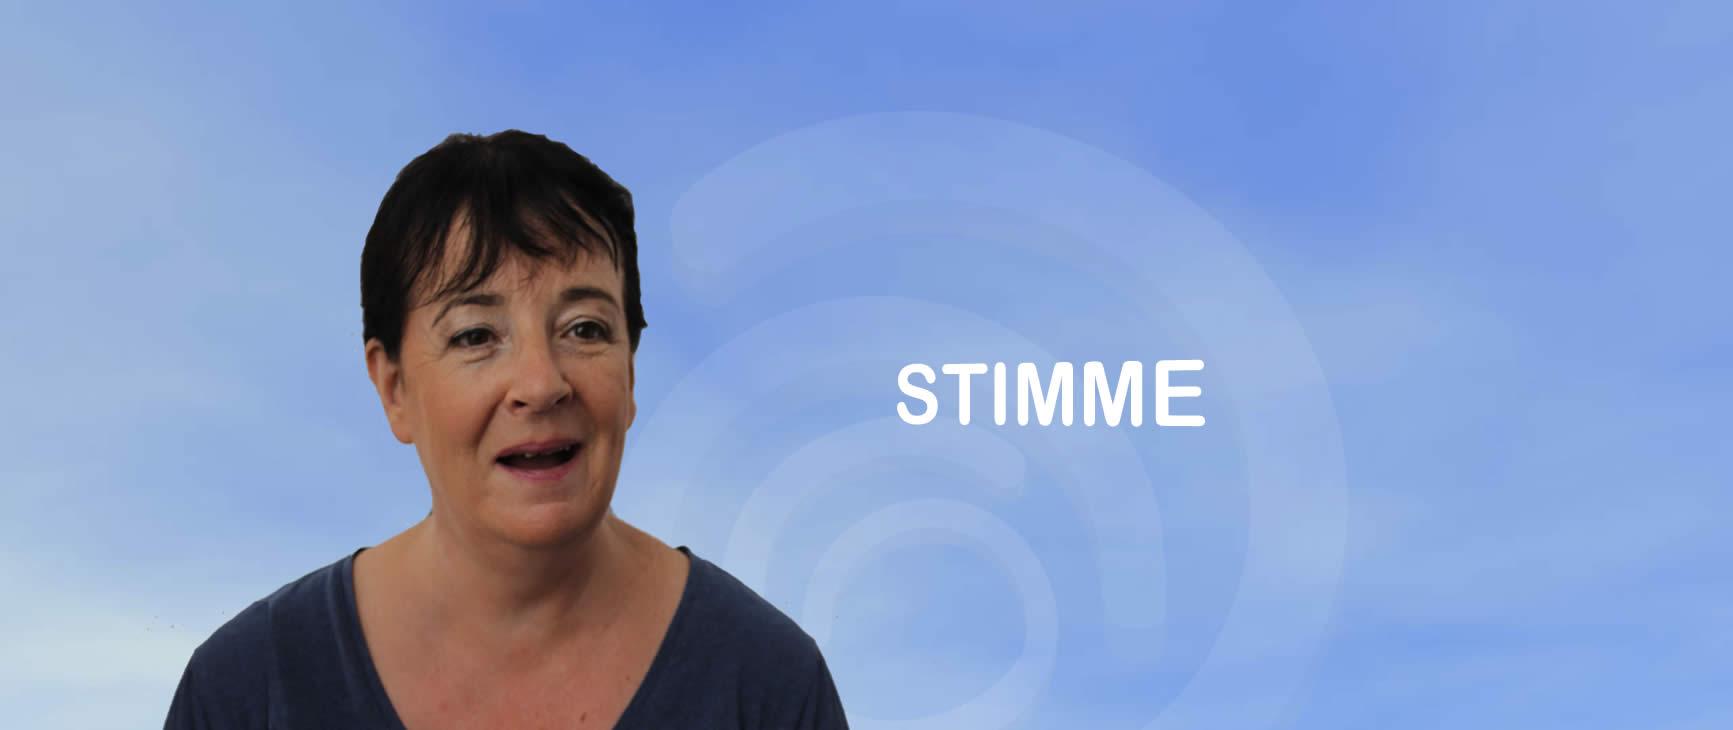 Atempädagogik mit Monika Opriessnig-Kumar - Stimme